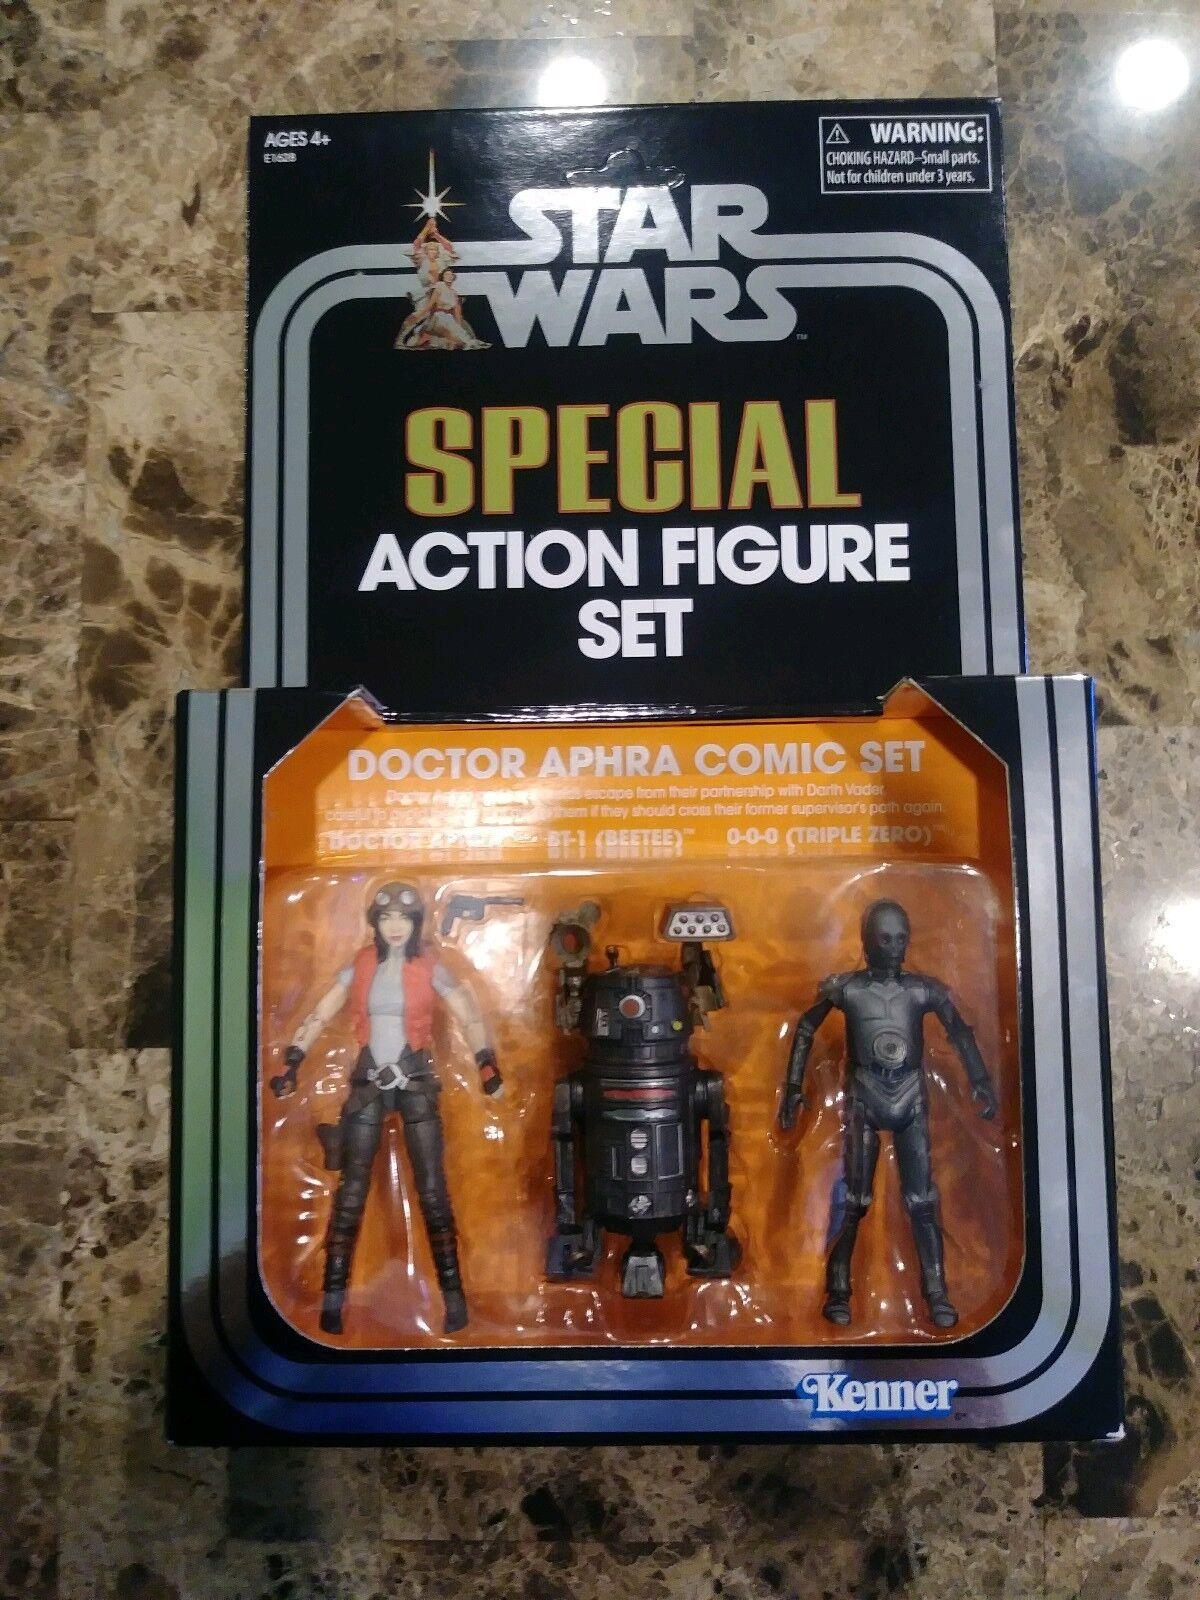 Star Wars Vintage Collection 2018 SDCC Exclusive Doctor Aphra Comic Set